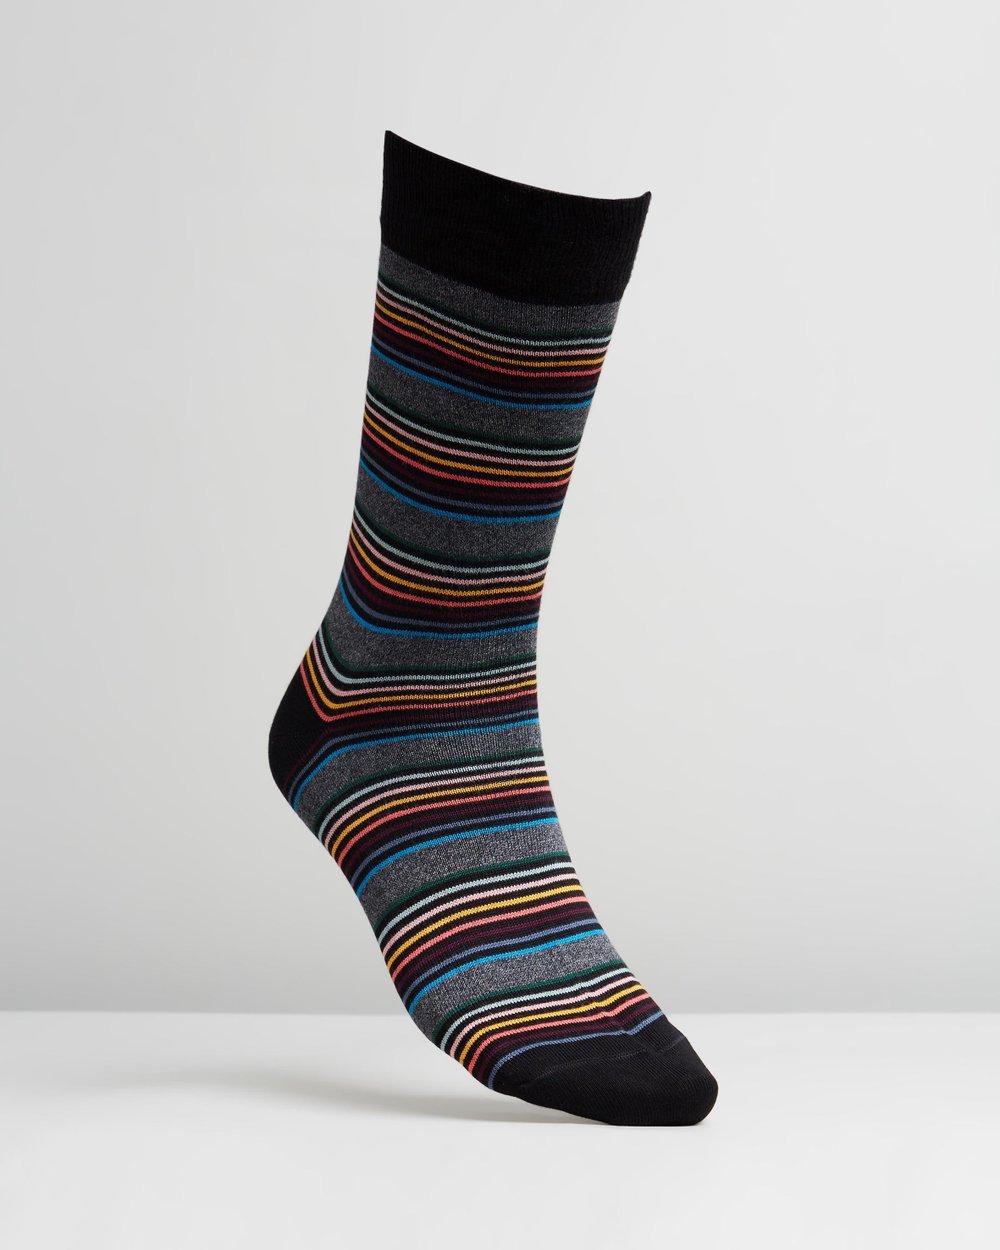 02ddeeb8c04 Twist Artist Socks by Paul Smith Online